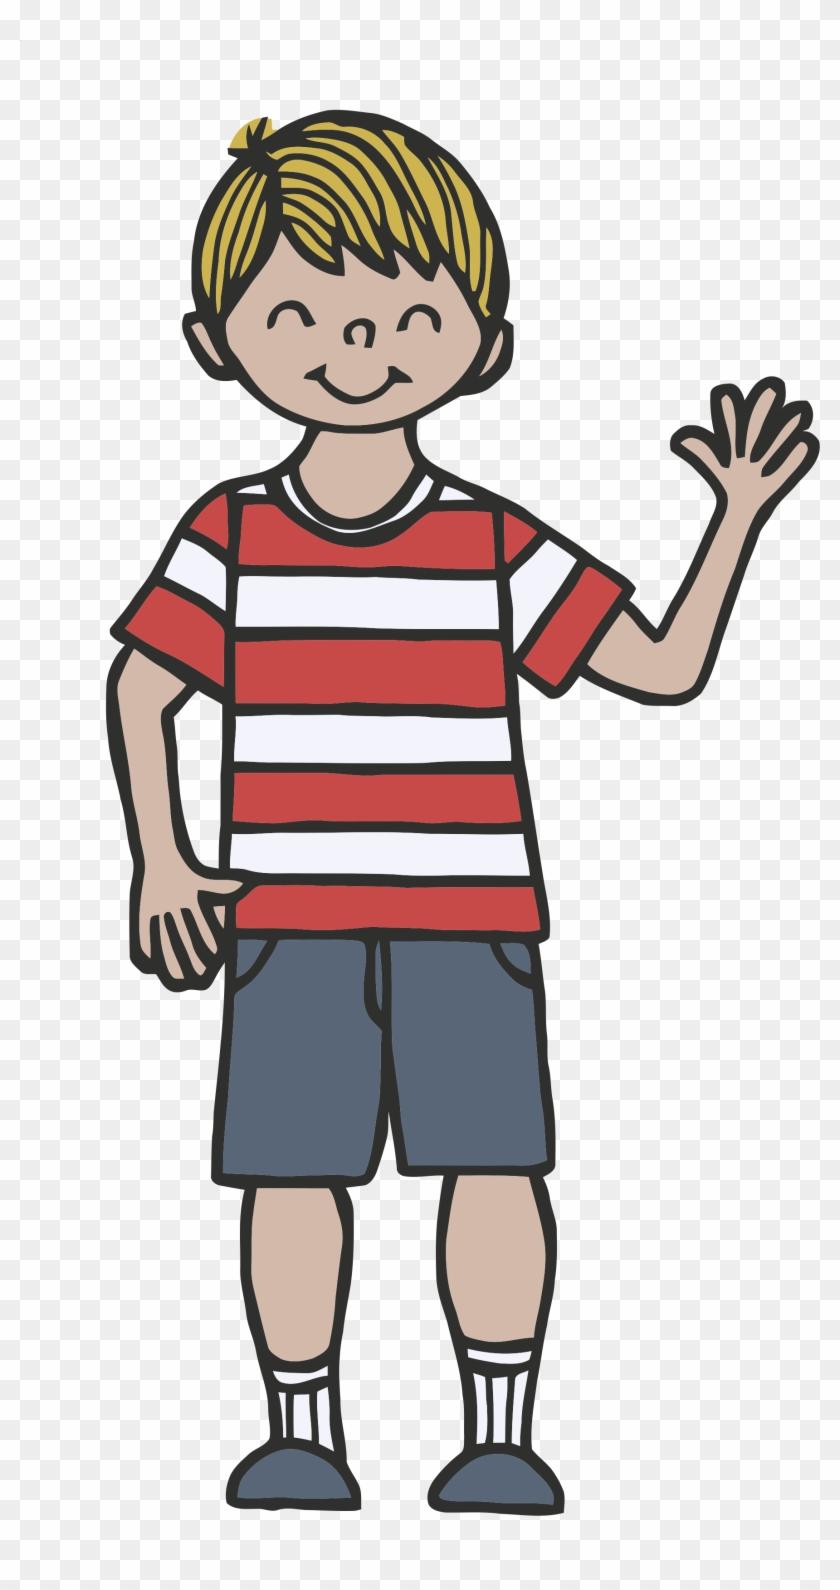 Child Waving Goodbye Clipart - Tall Boy Clip Art #7152